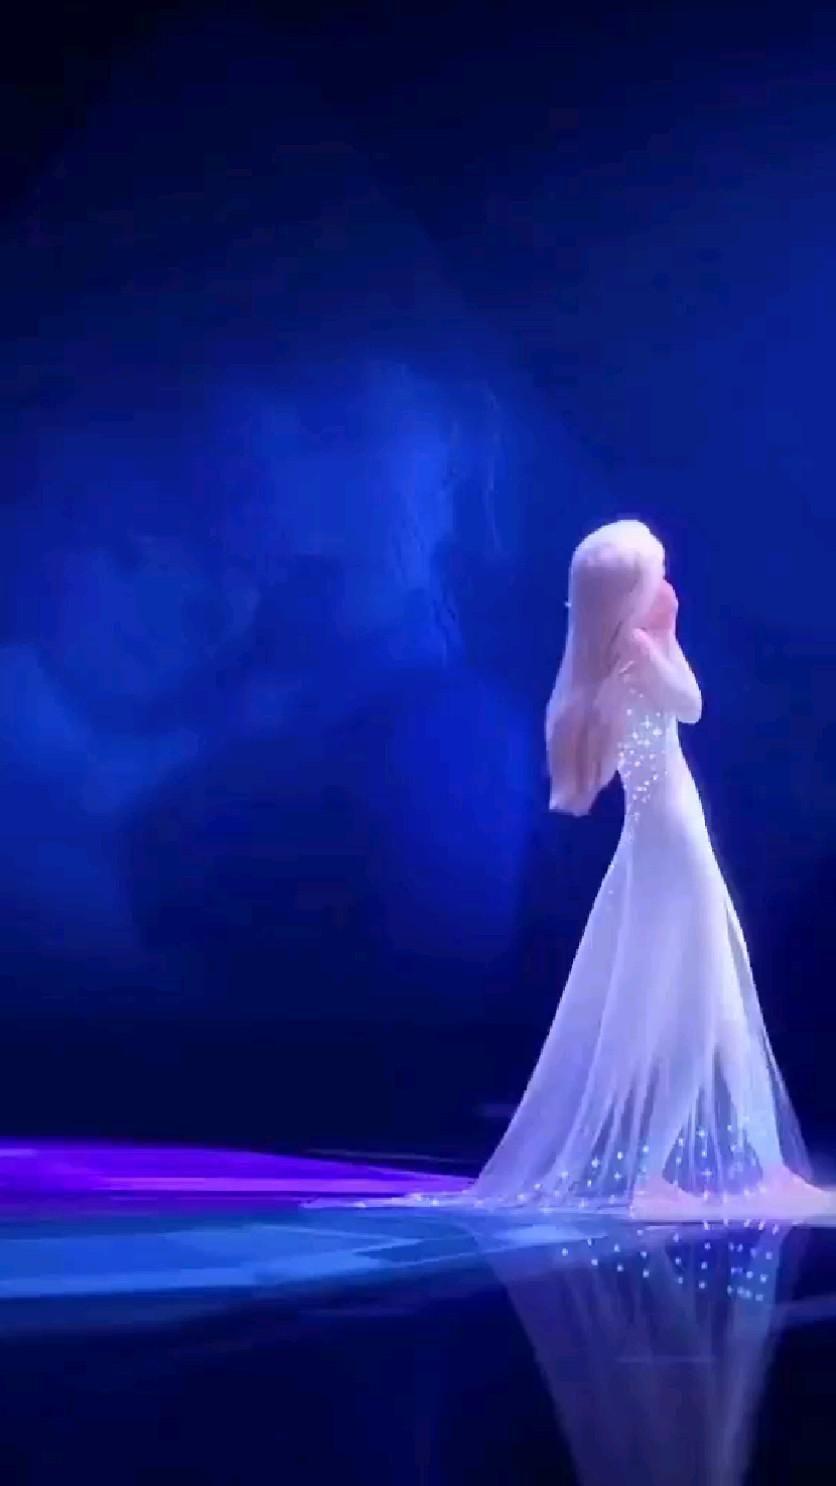 Frozen 2❄️❄️